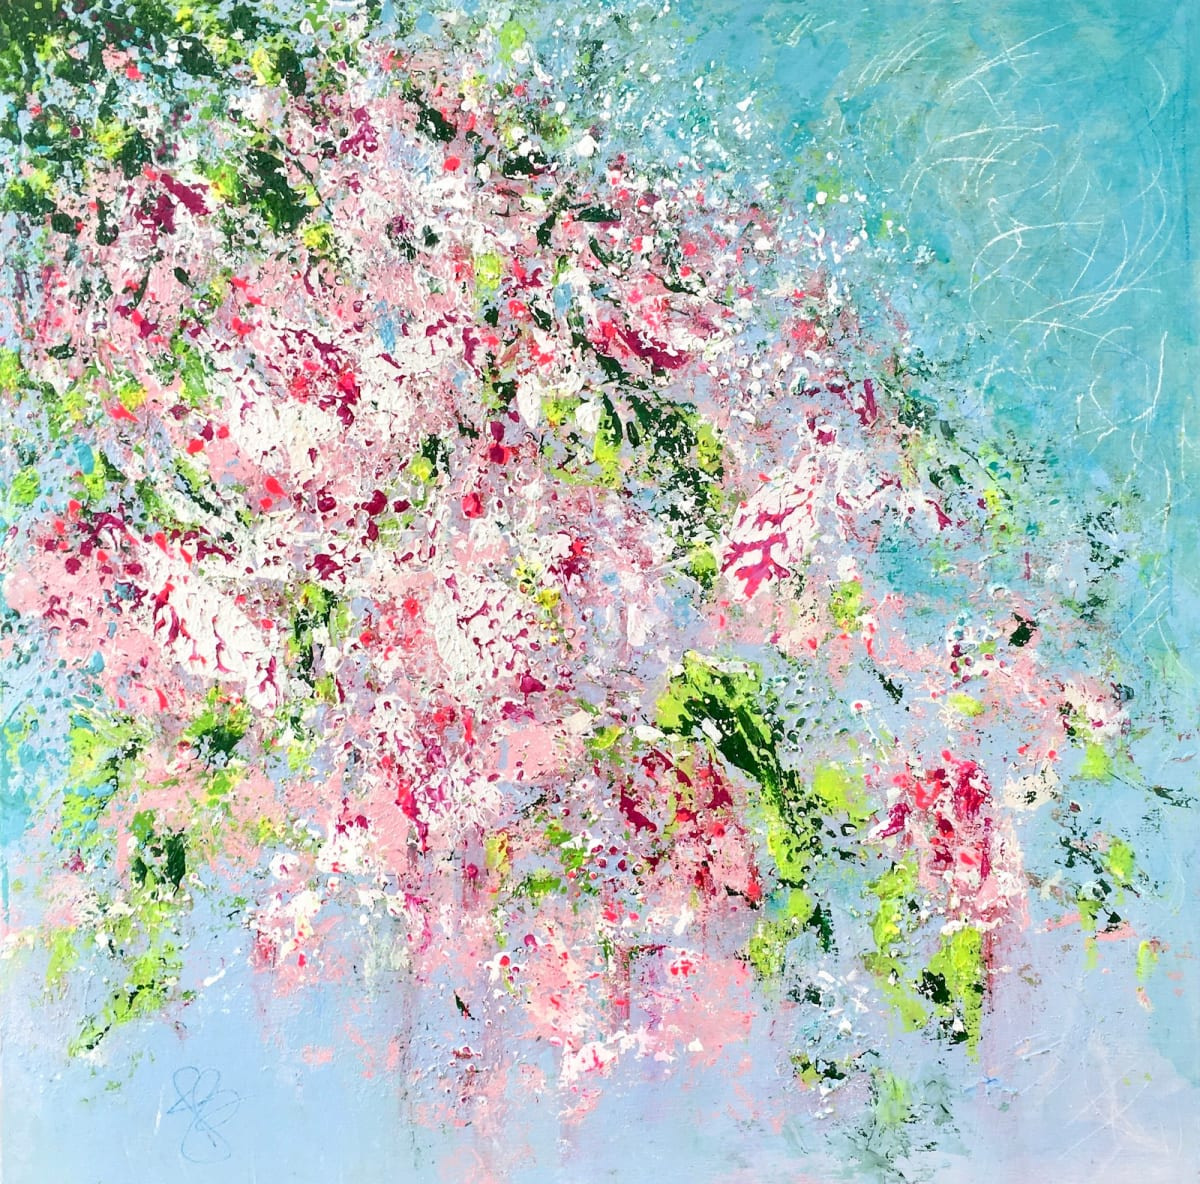 Pretty in Pink by Julea Boswell